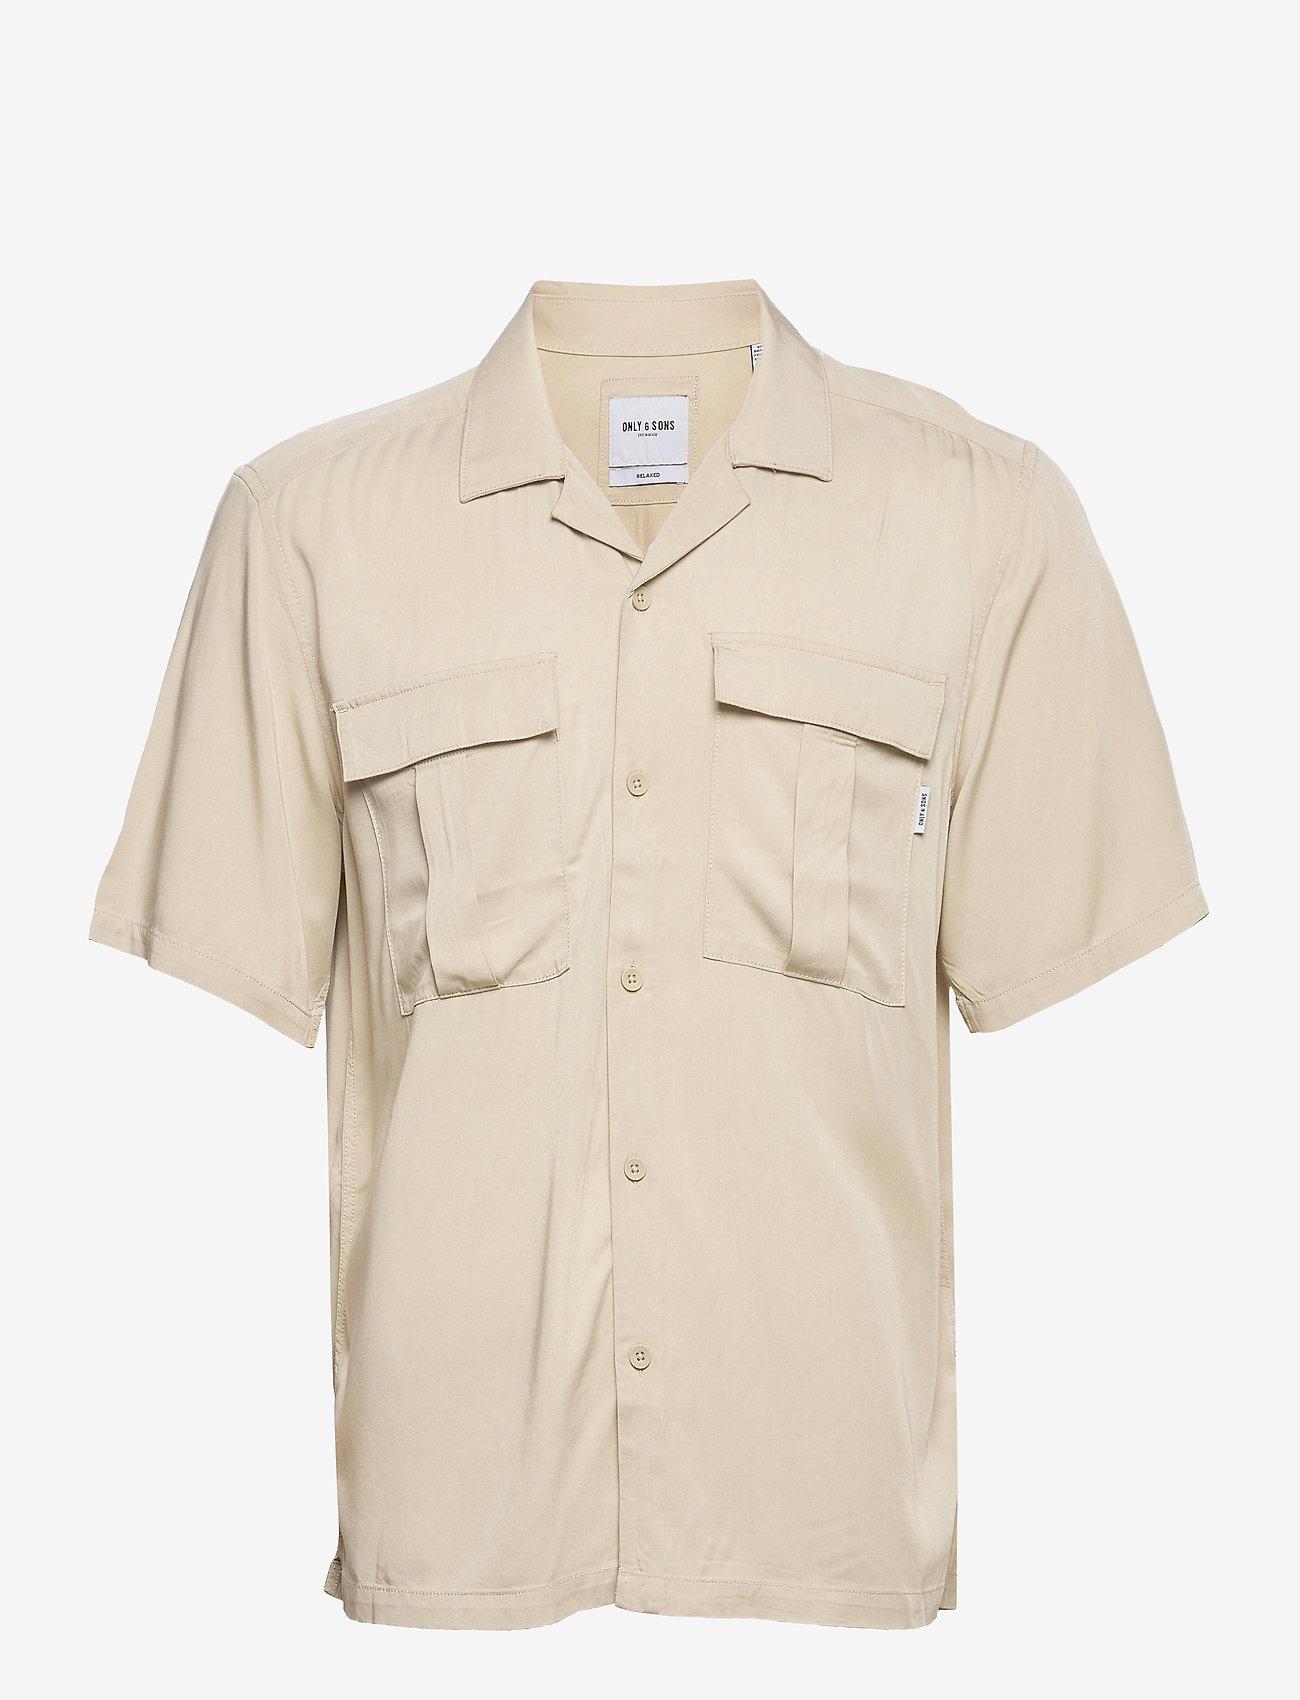 ONLY & SONS - ONSSCOTTIE LIFE SS UTILITY RELAXED SHIRT - koszule w kratkę - pelican - 0